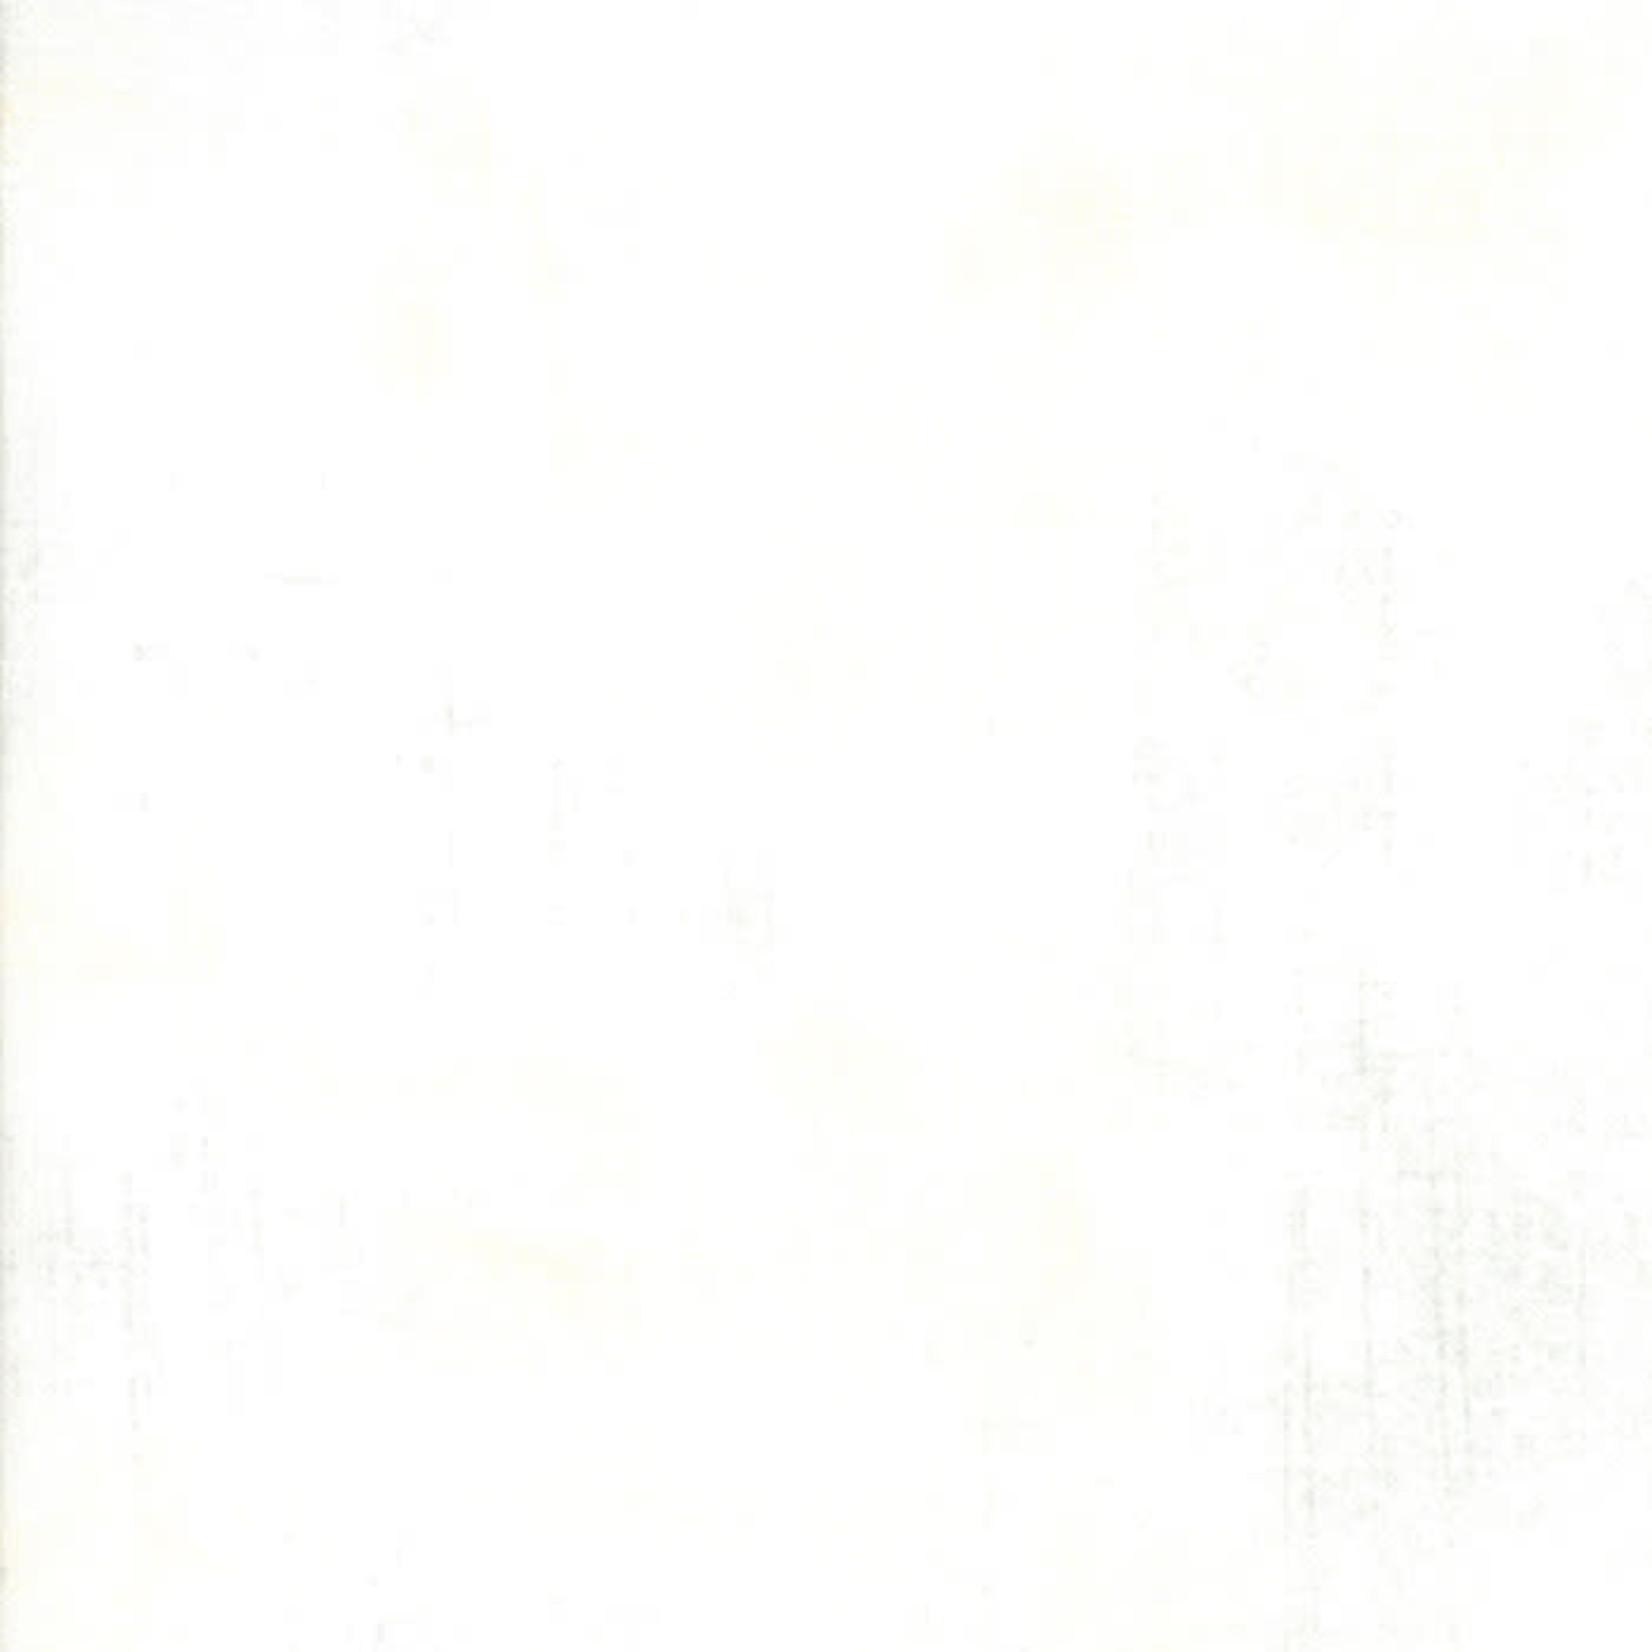 Moda BasicGray - Grunge - White